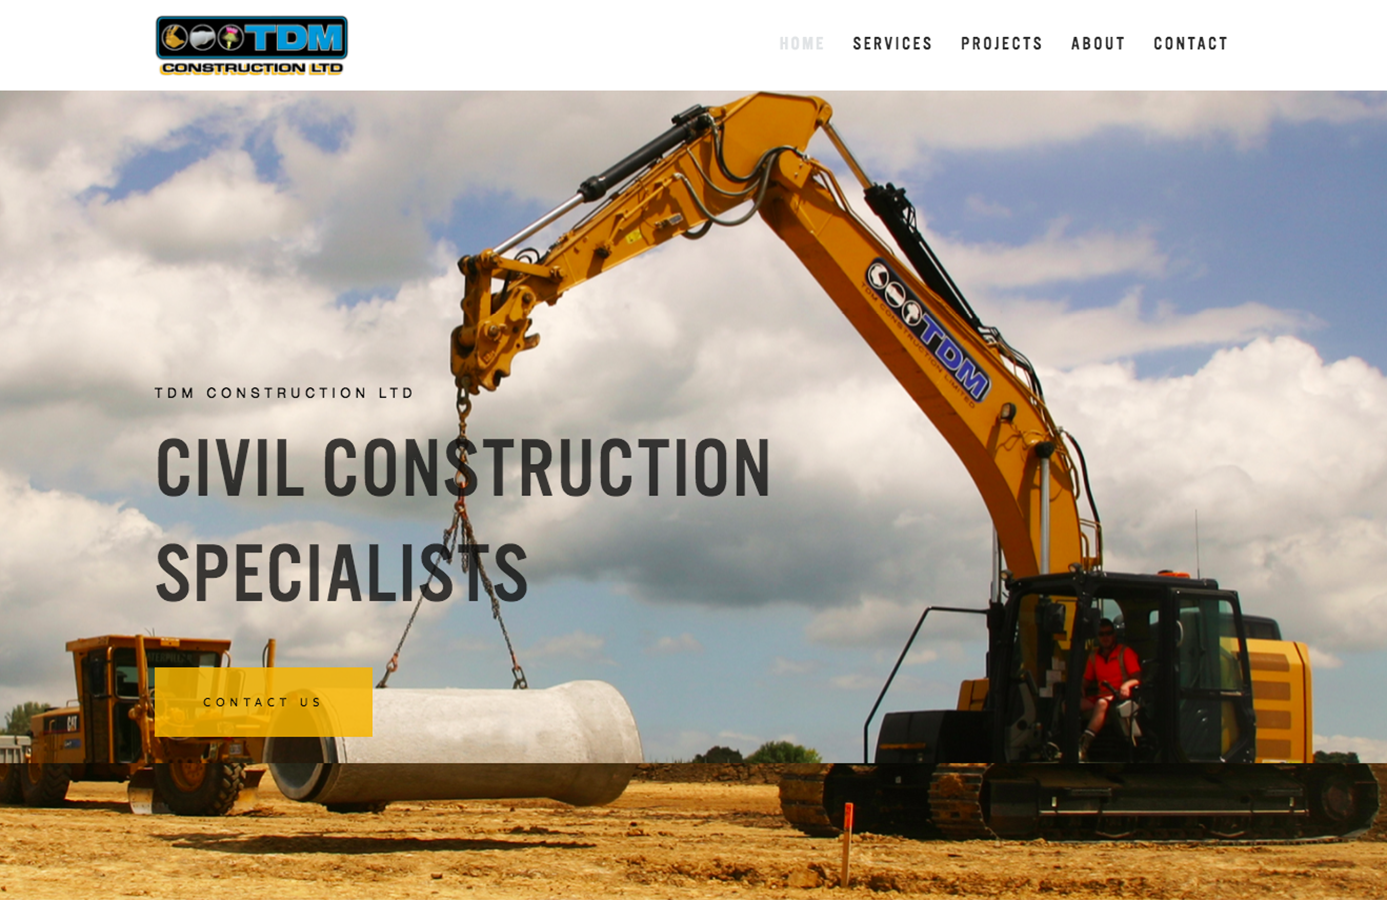 tdm-construction.png